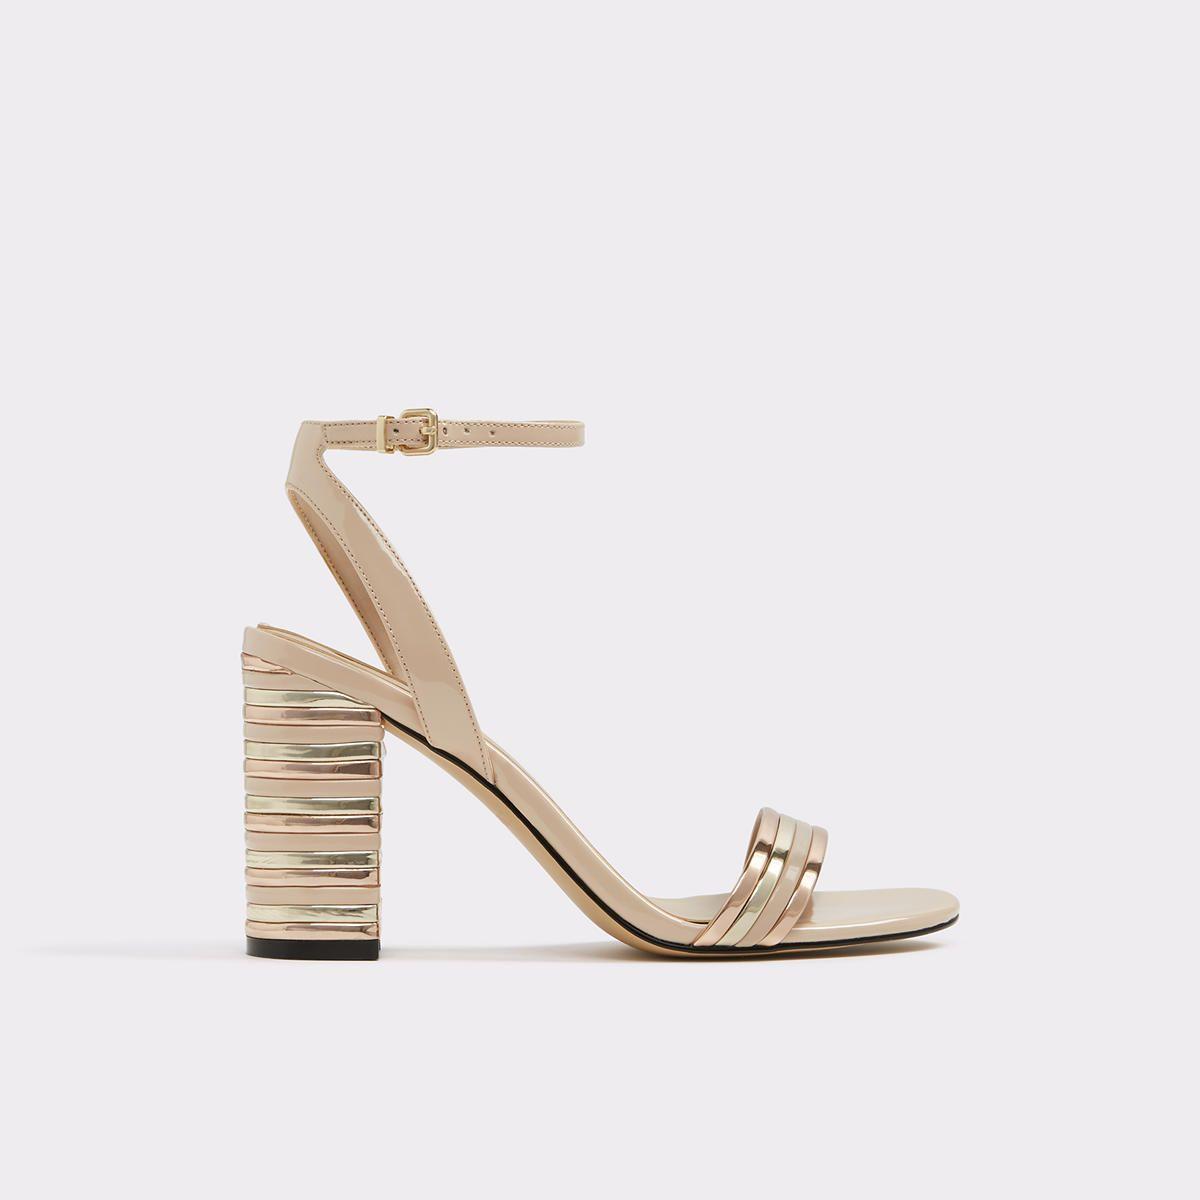 Bridal Shoes Aldo: Izabela Red Women's Sandals